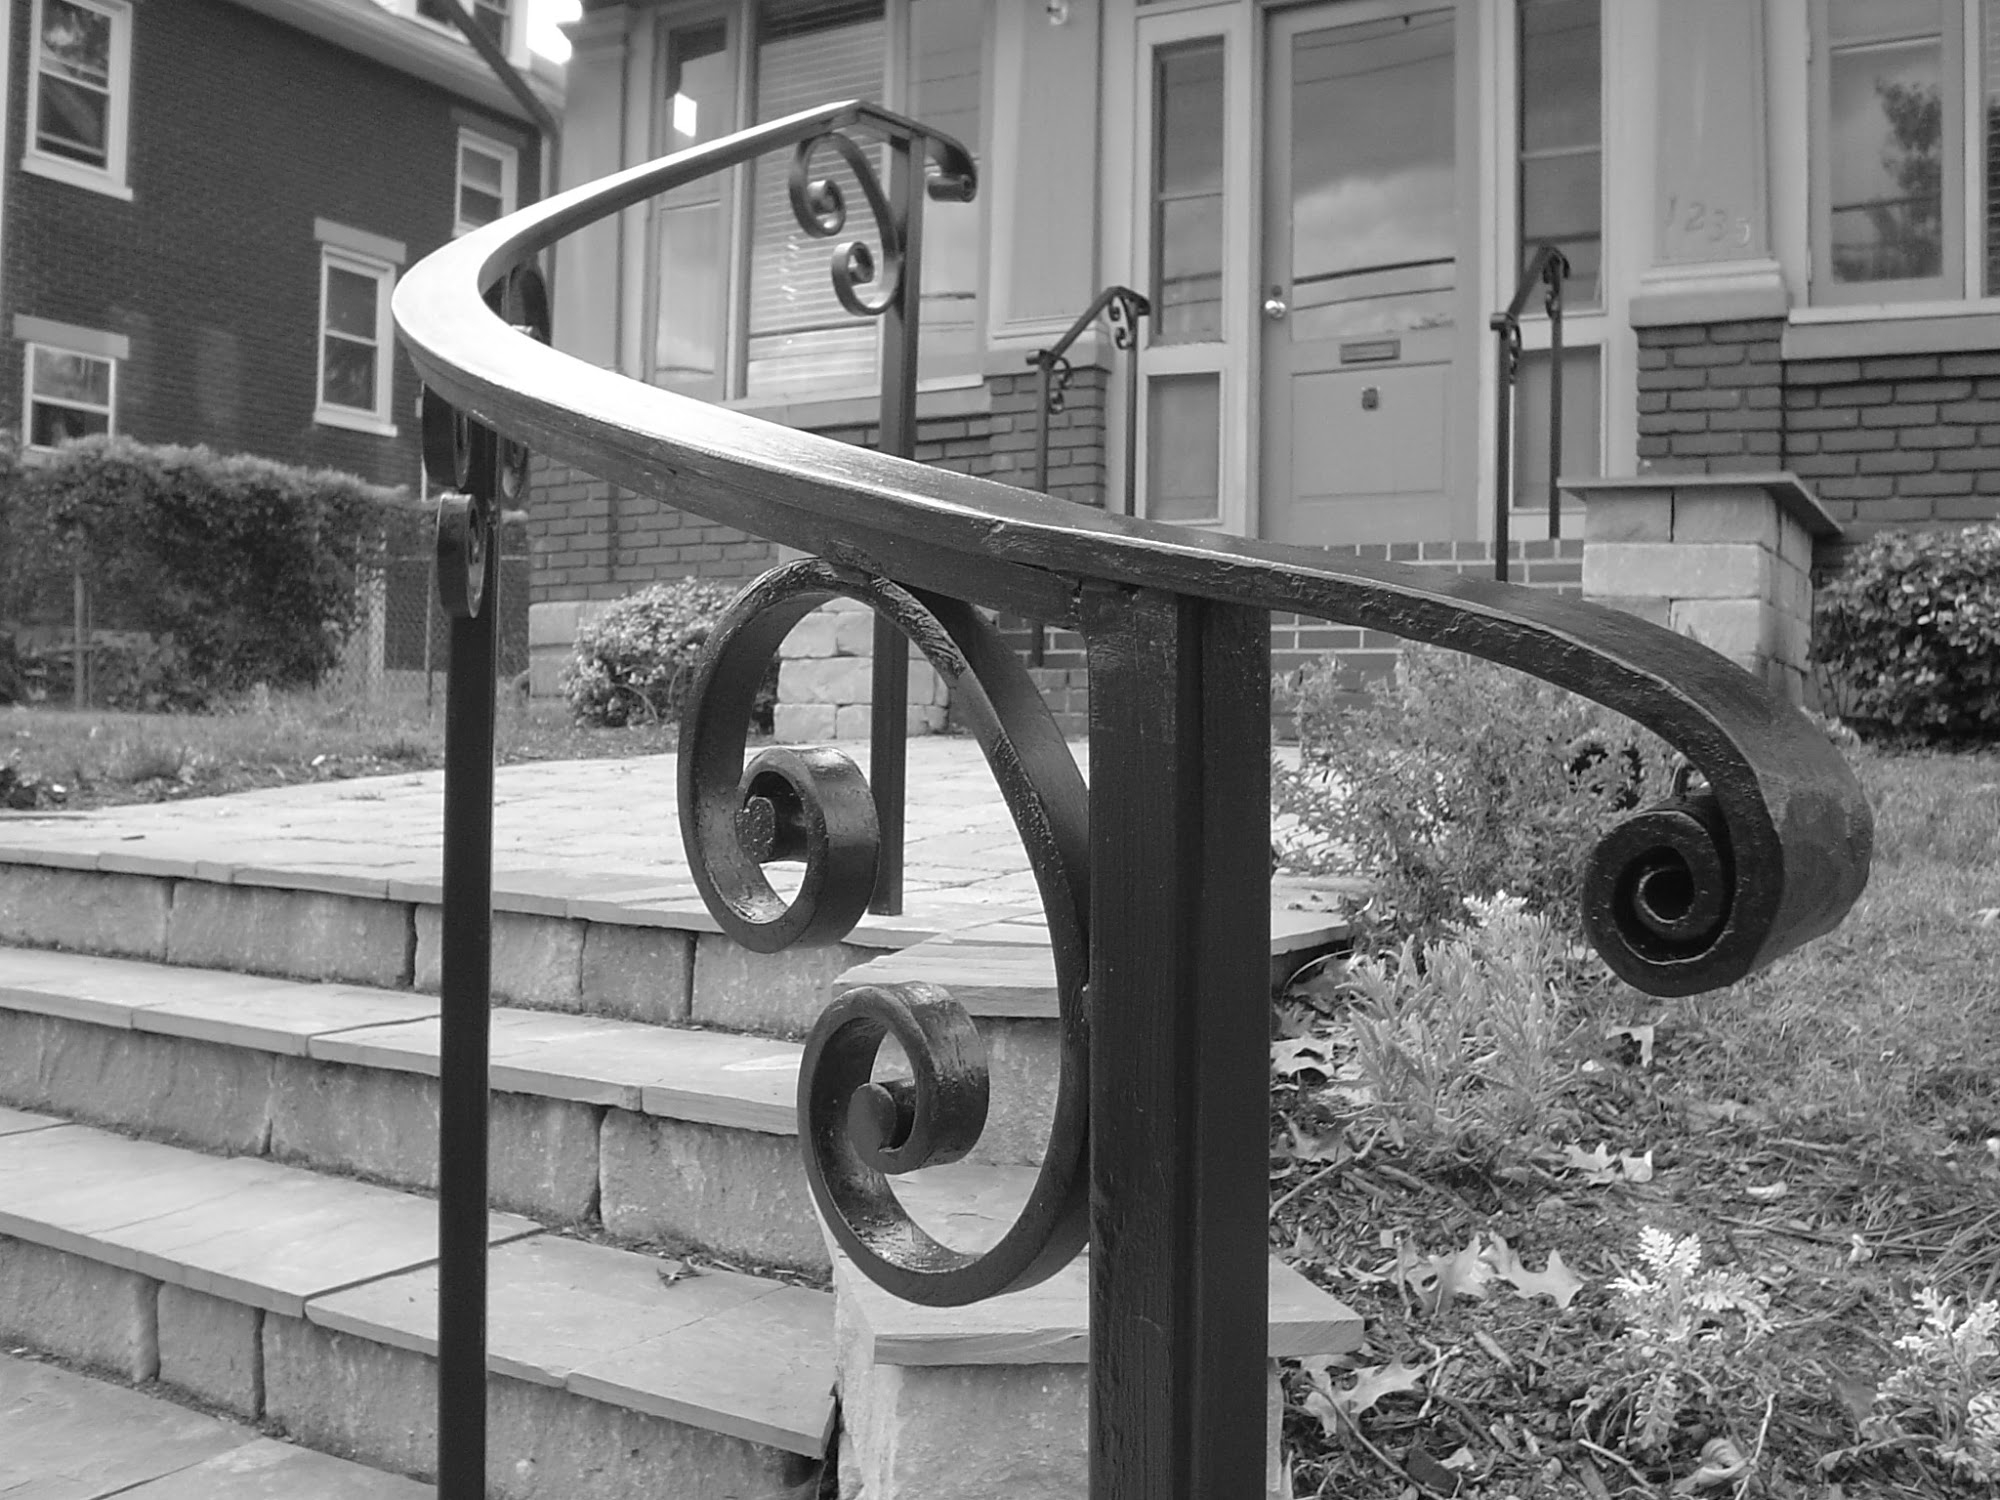 Exterior Railings Antietam Iron Works | Curved Wrought Iron Railings | Colonial | Wood | Wall Mounted | Outdoor | Veranda